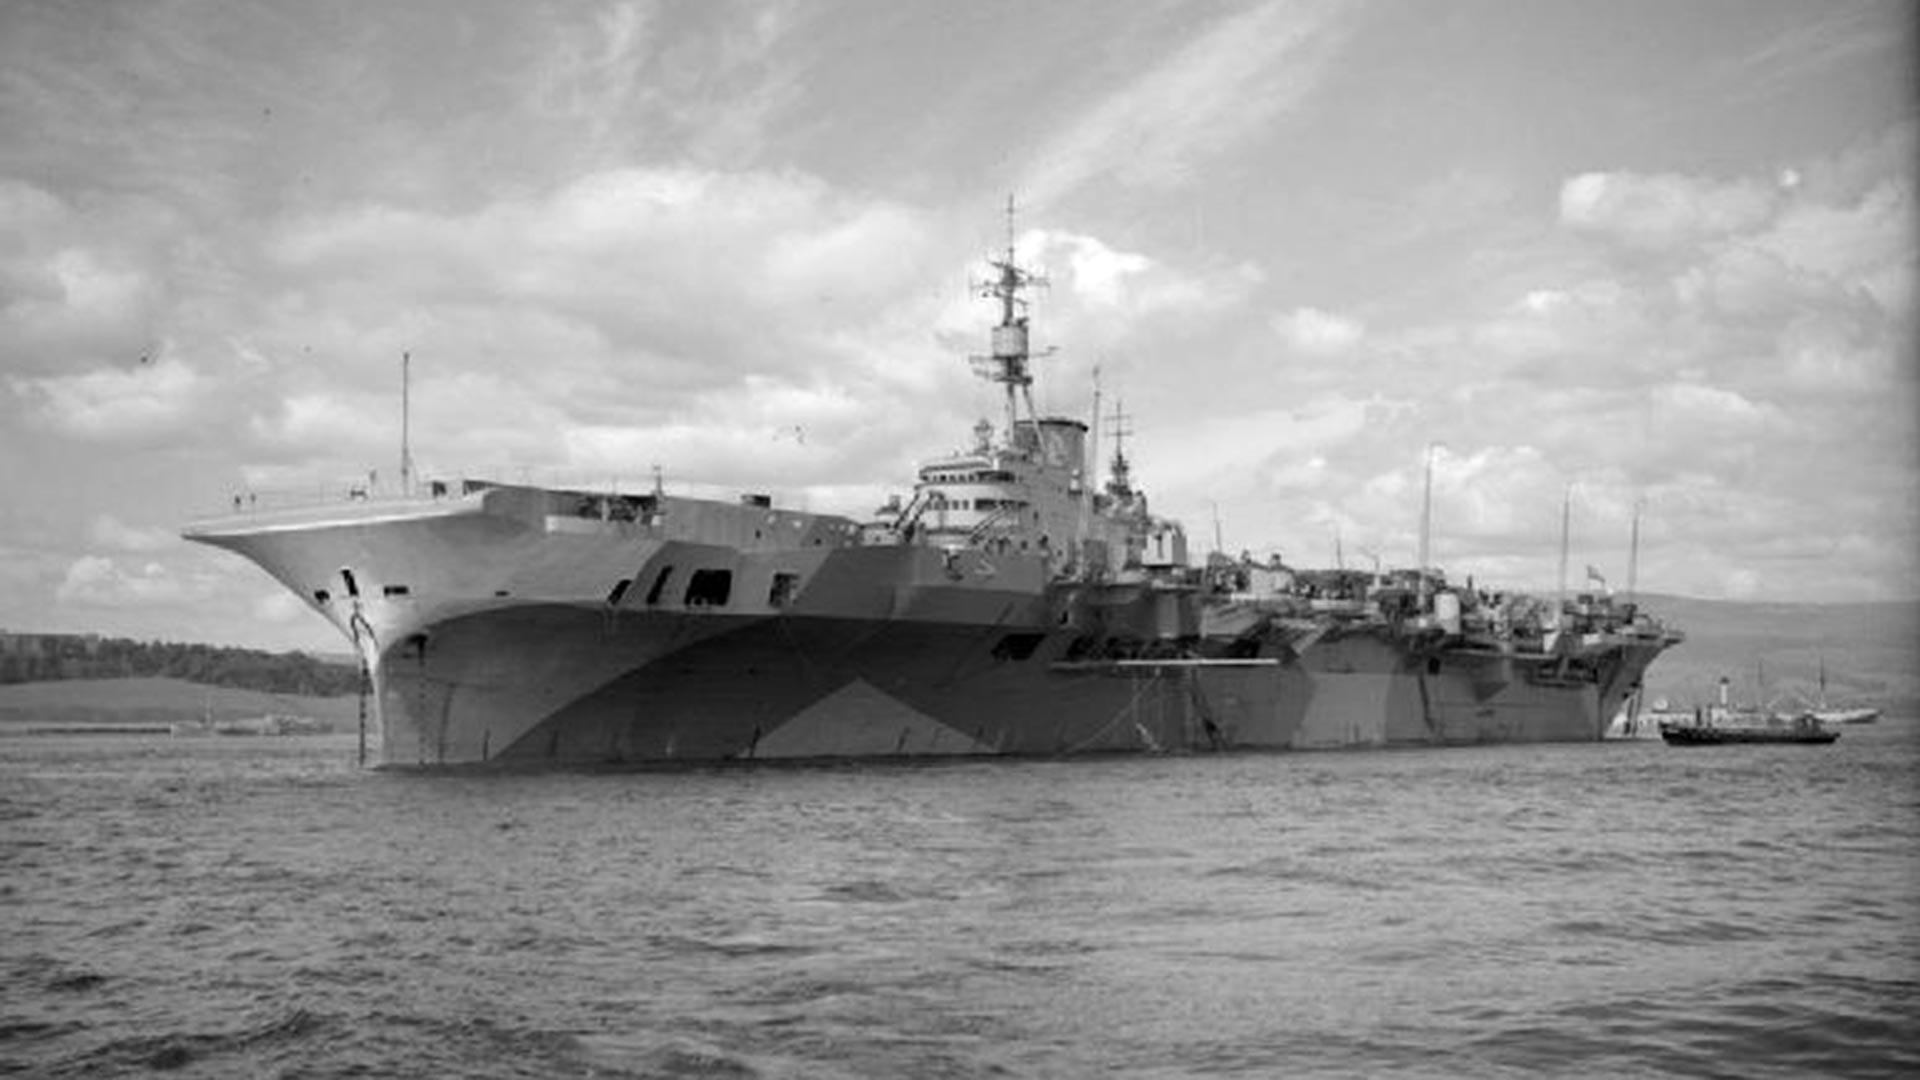 Porte-avions britannique HMS Implacable